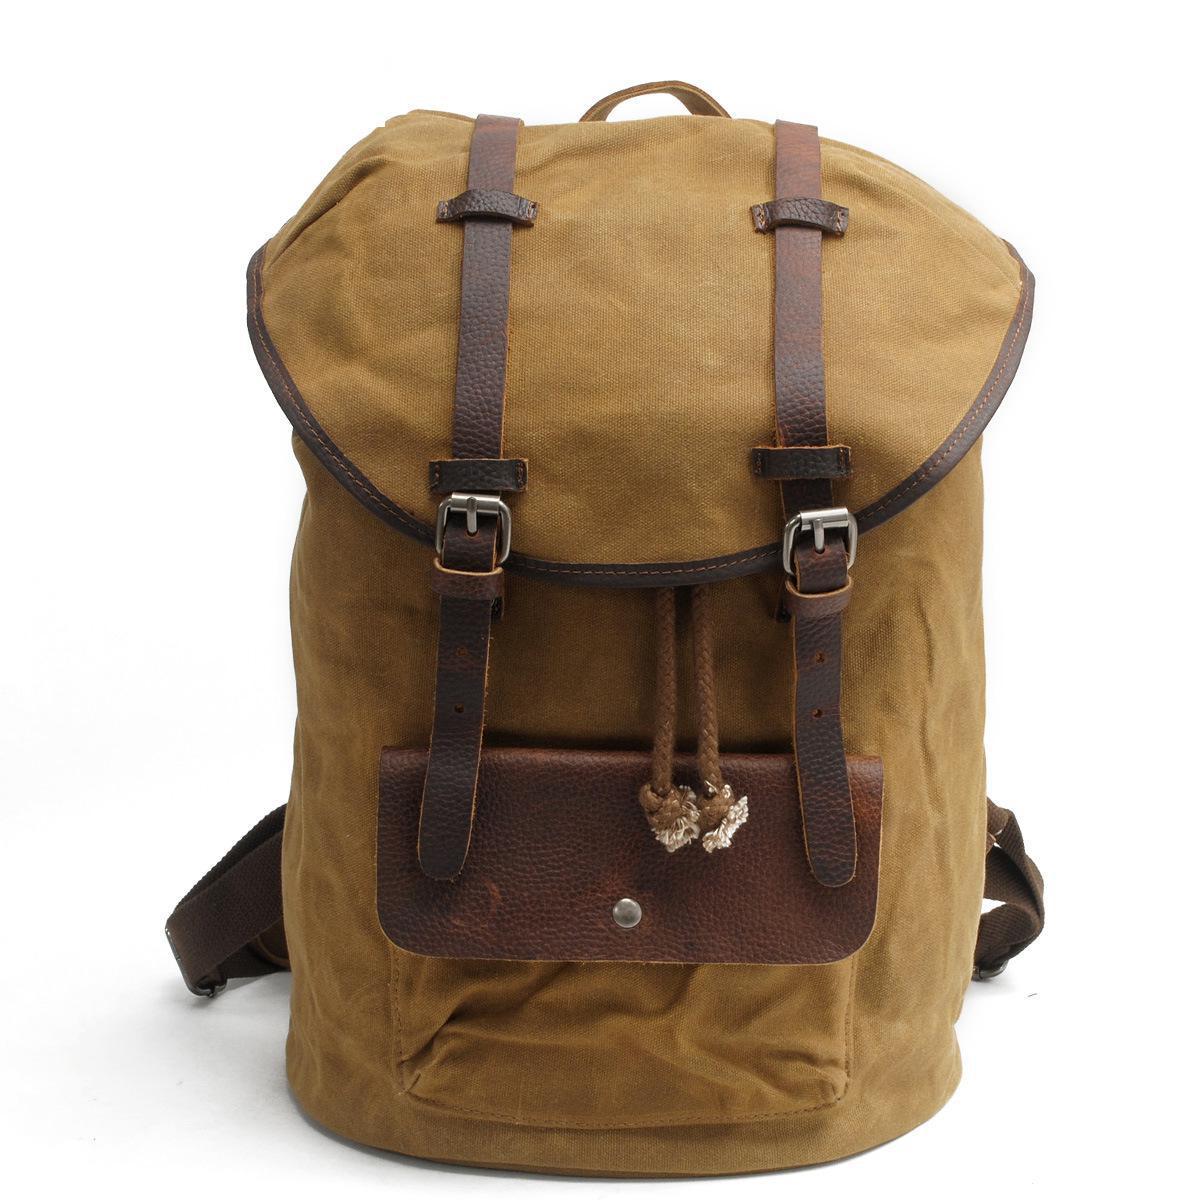 ФОТО High Quality Vintage Fashion Casual Canvas Crazy Horse Leather Women Men Backpack Rucksack Shoulder Bag Bags For Men Women